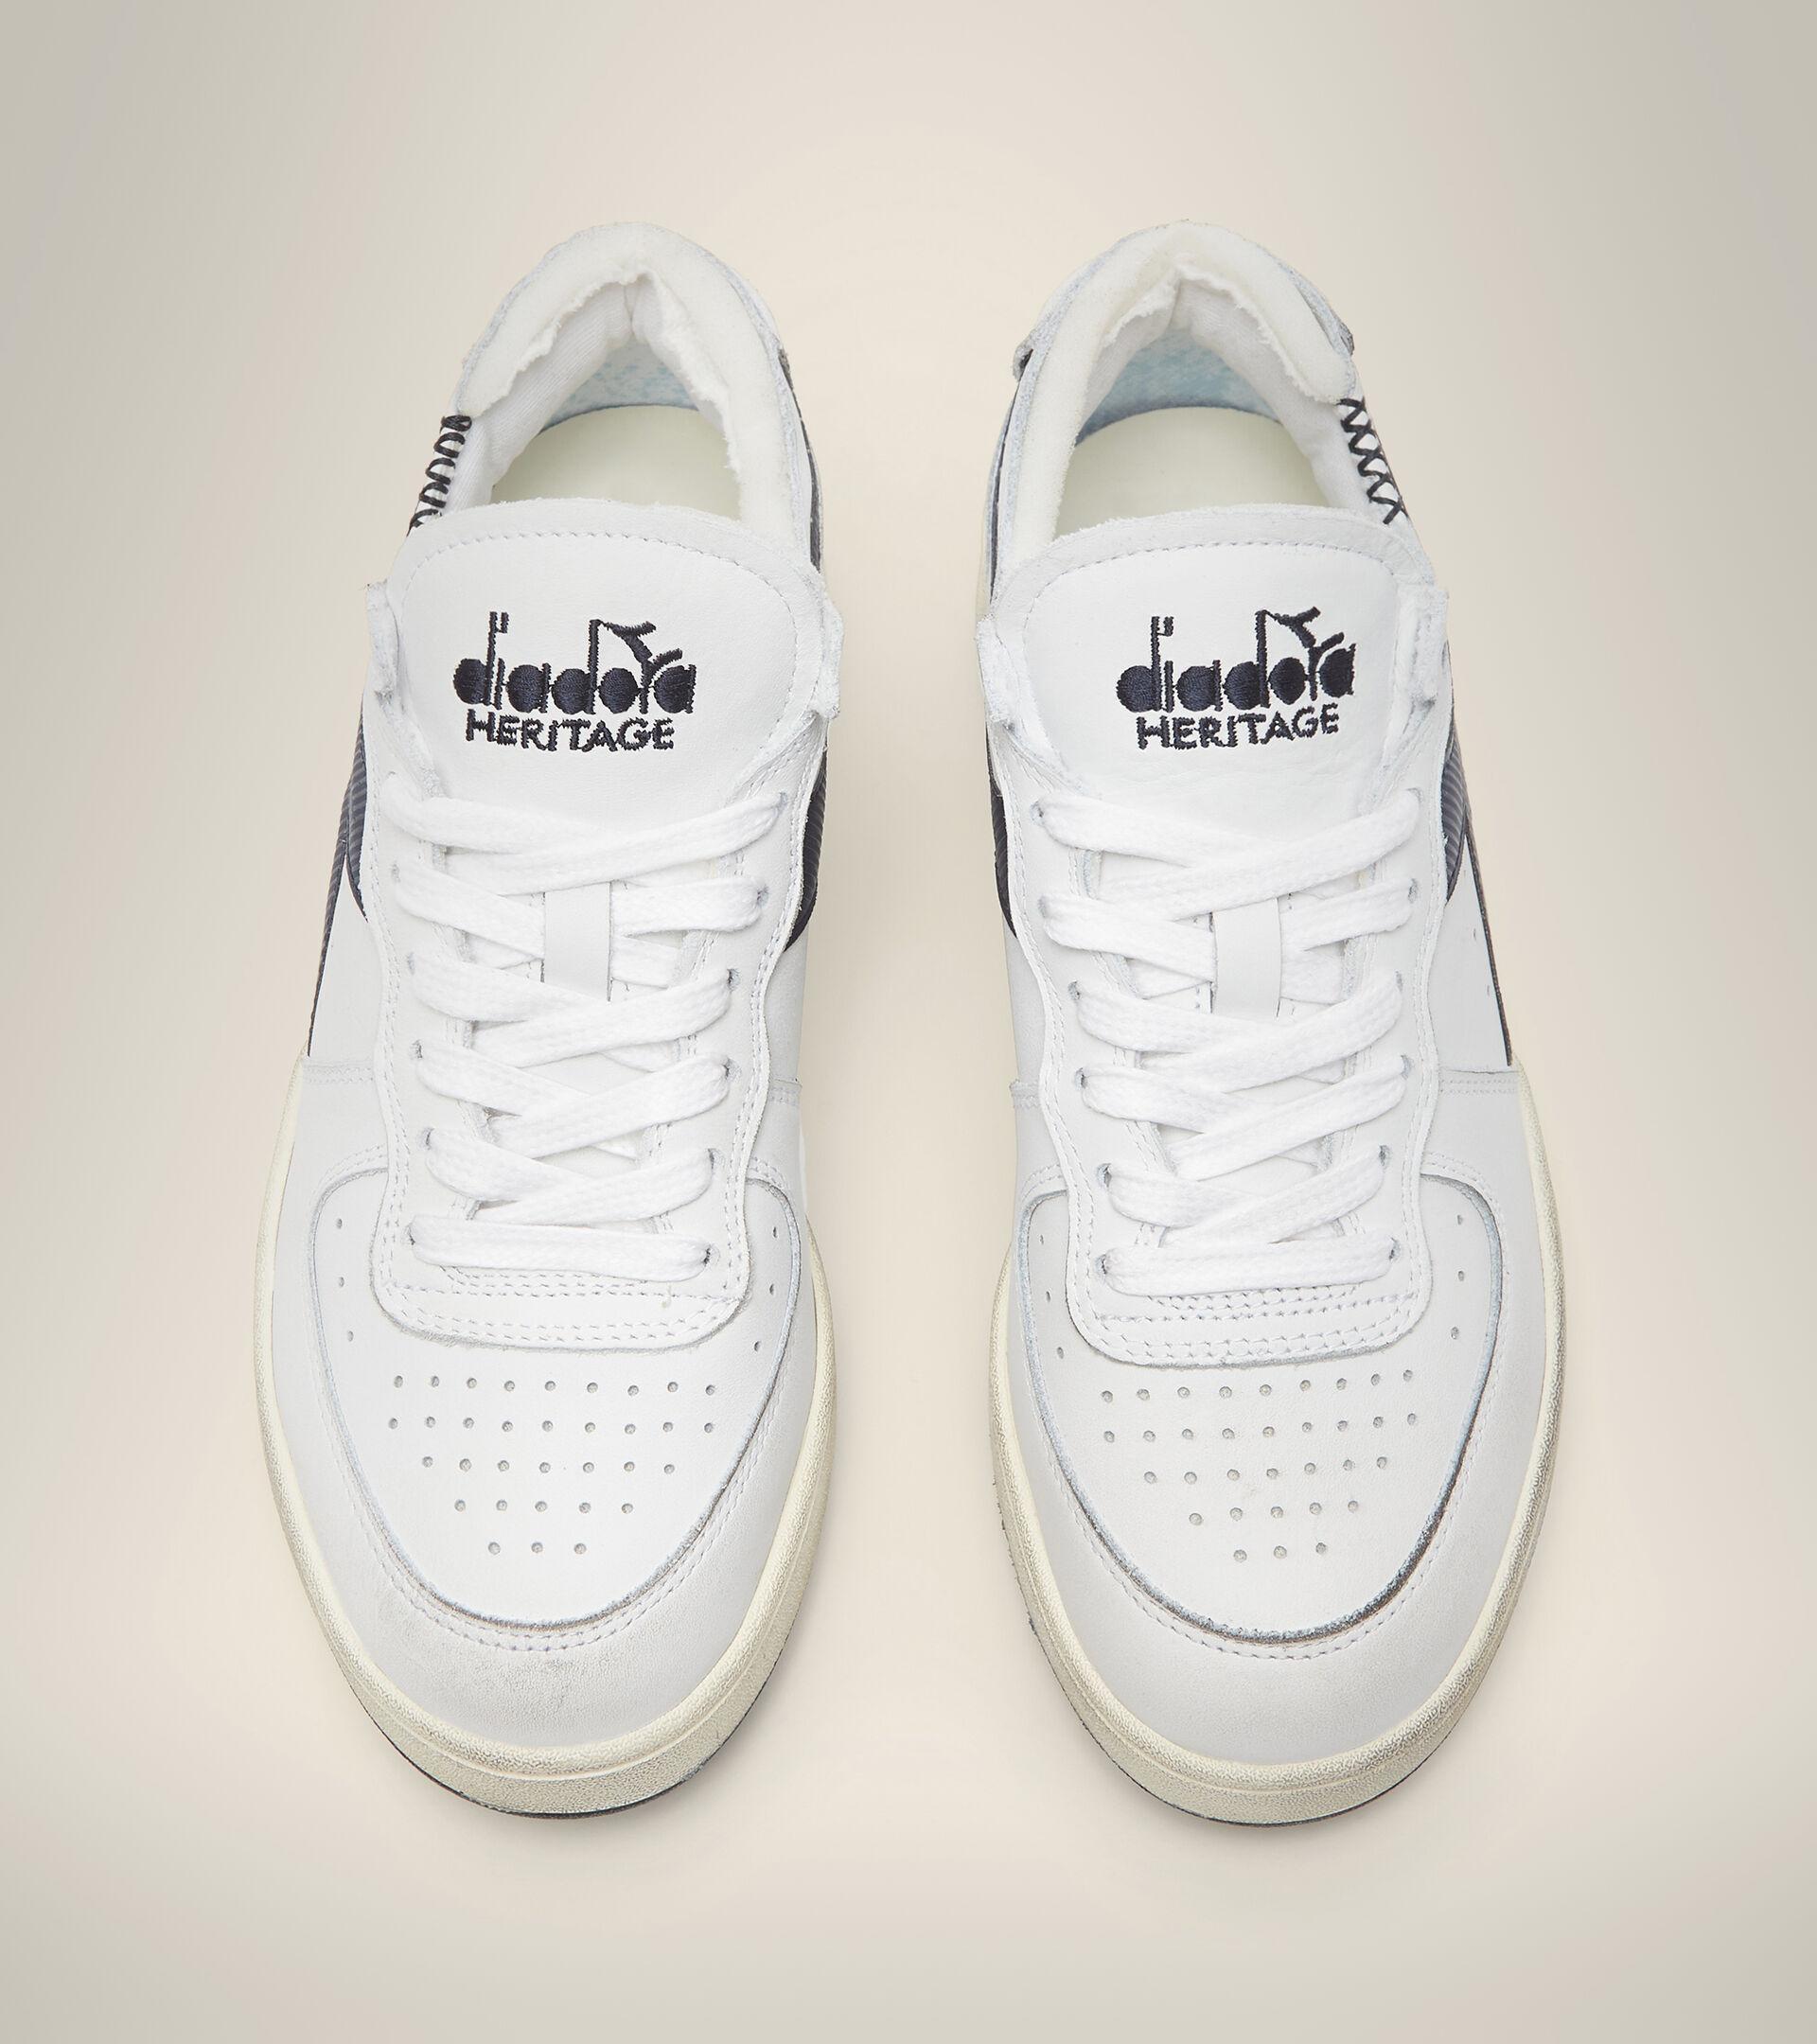 Footwear Heritage UNISEX MI BASKET ROW CUT BLANCO/NEGRO IRIS Diadora